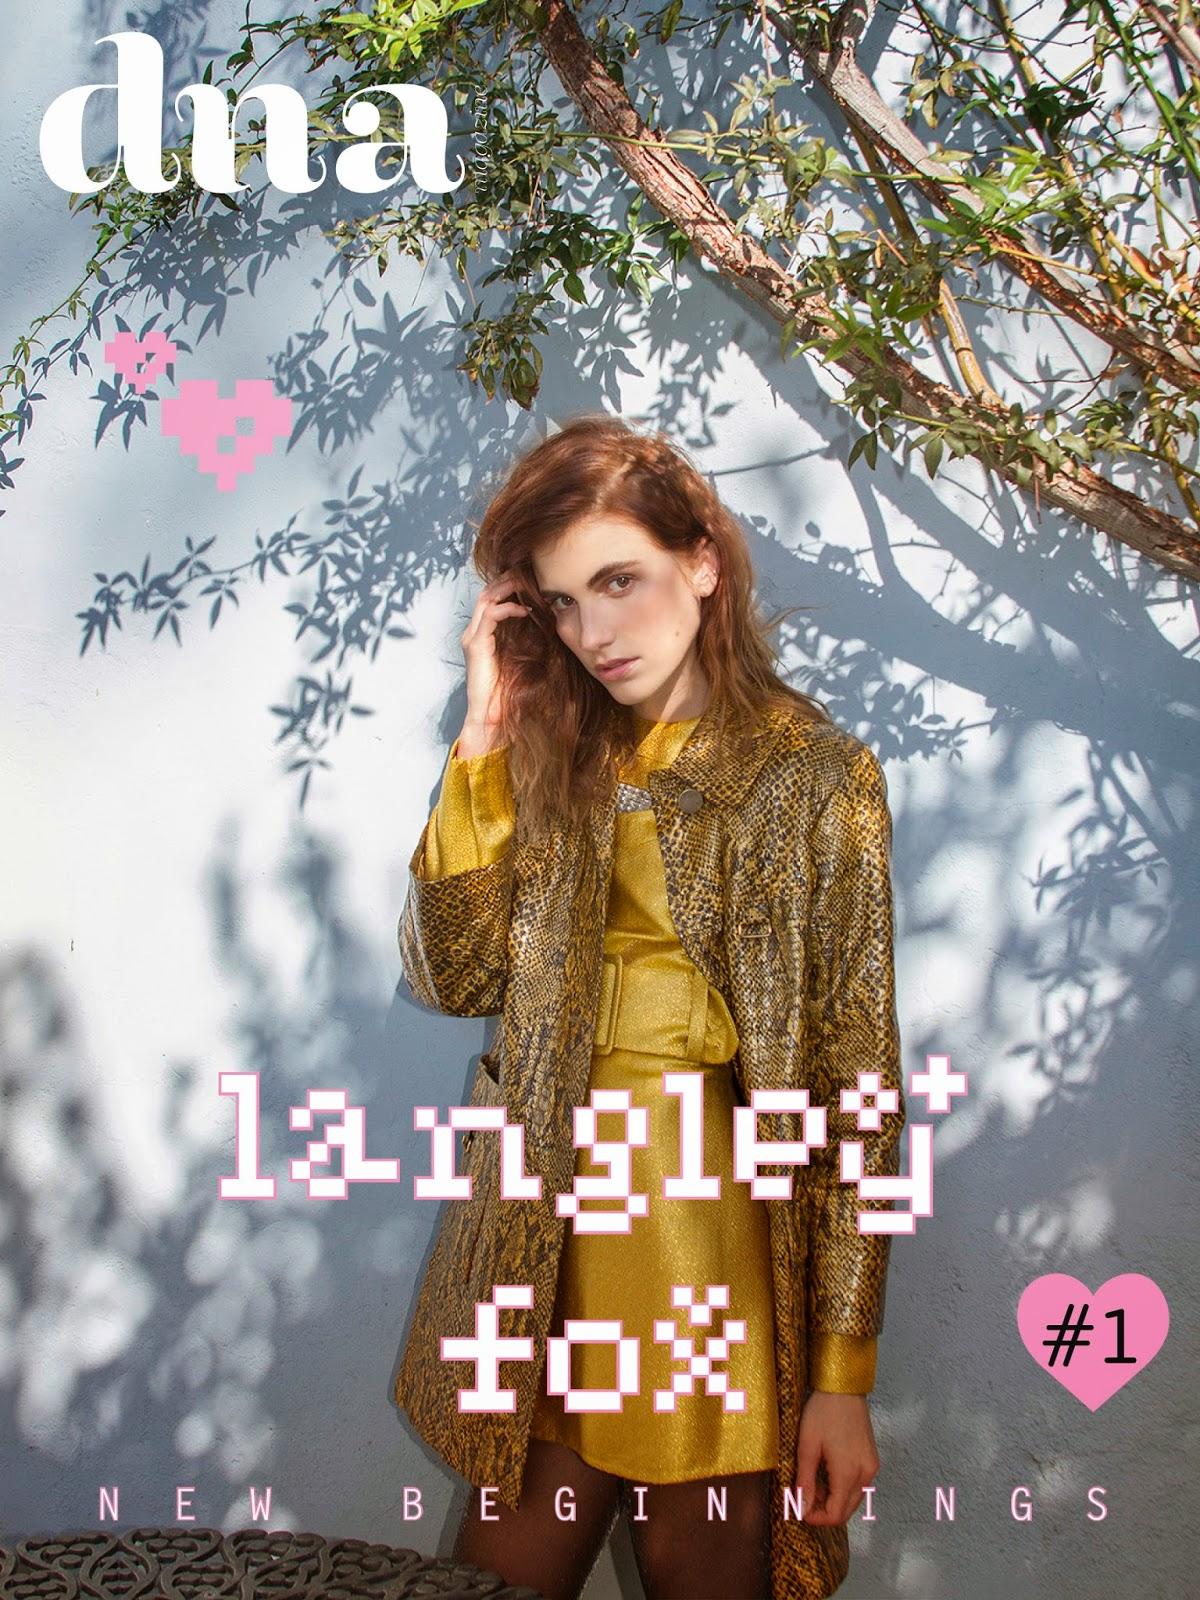 Langley Fox Hemingway - DNA Featuring Langley Fox